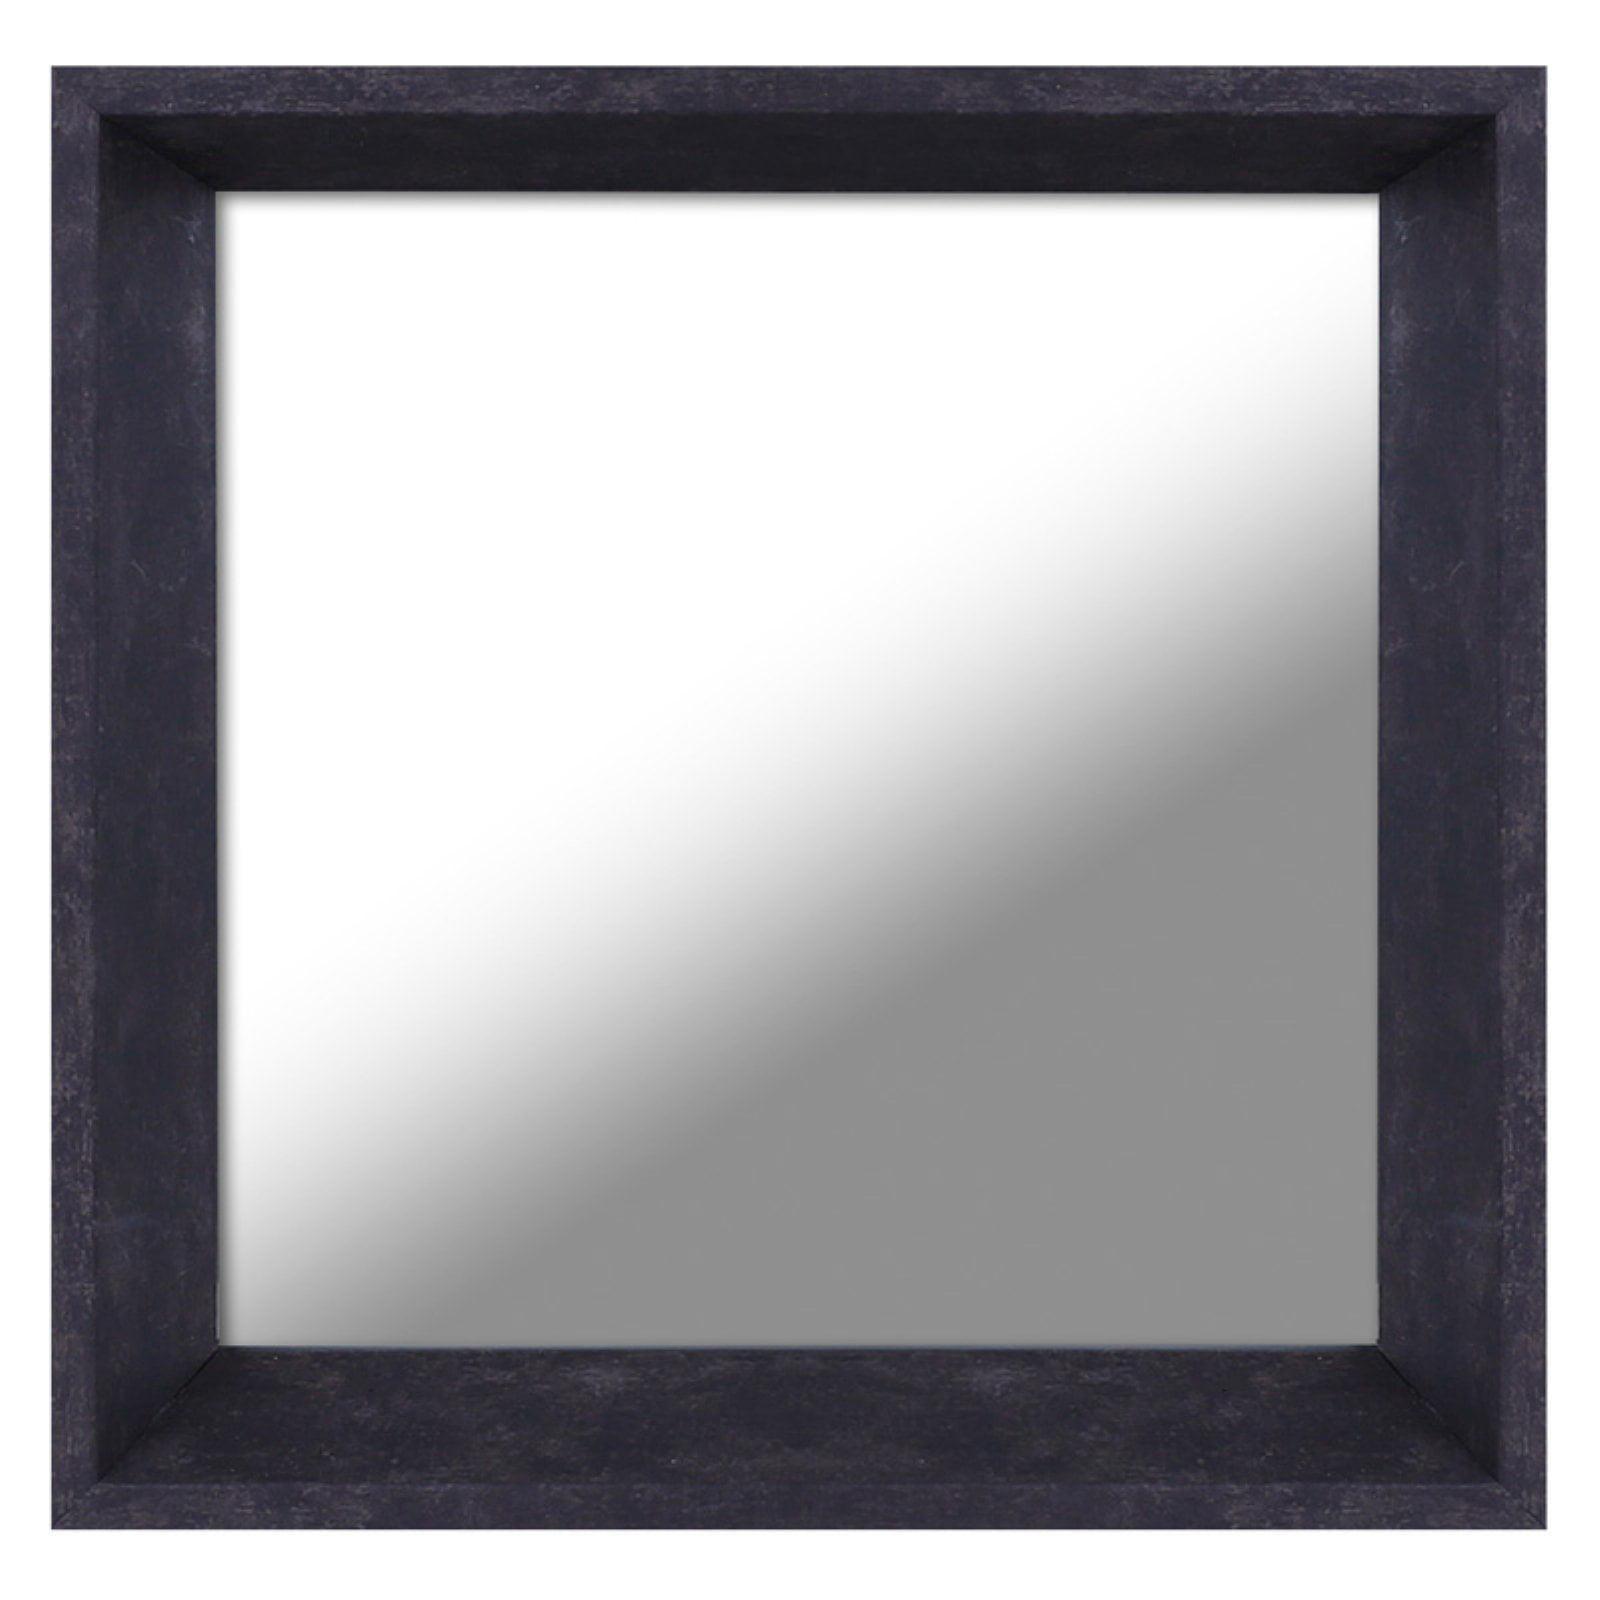 Mirrorize Canada Plastic Mirror White - 10.5W x 10.5H in. - Set of 3